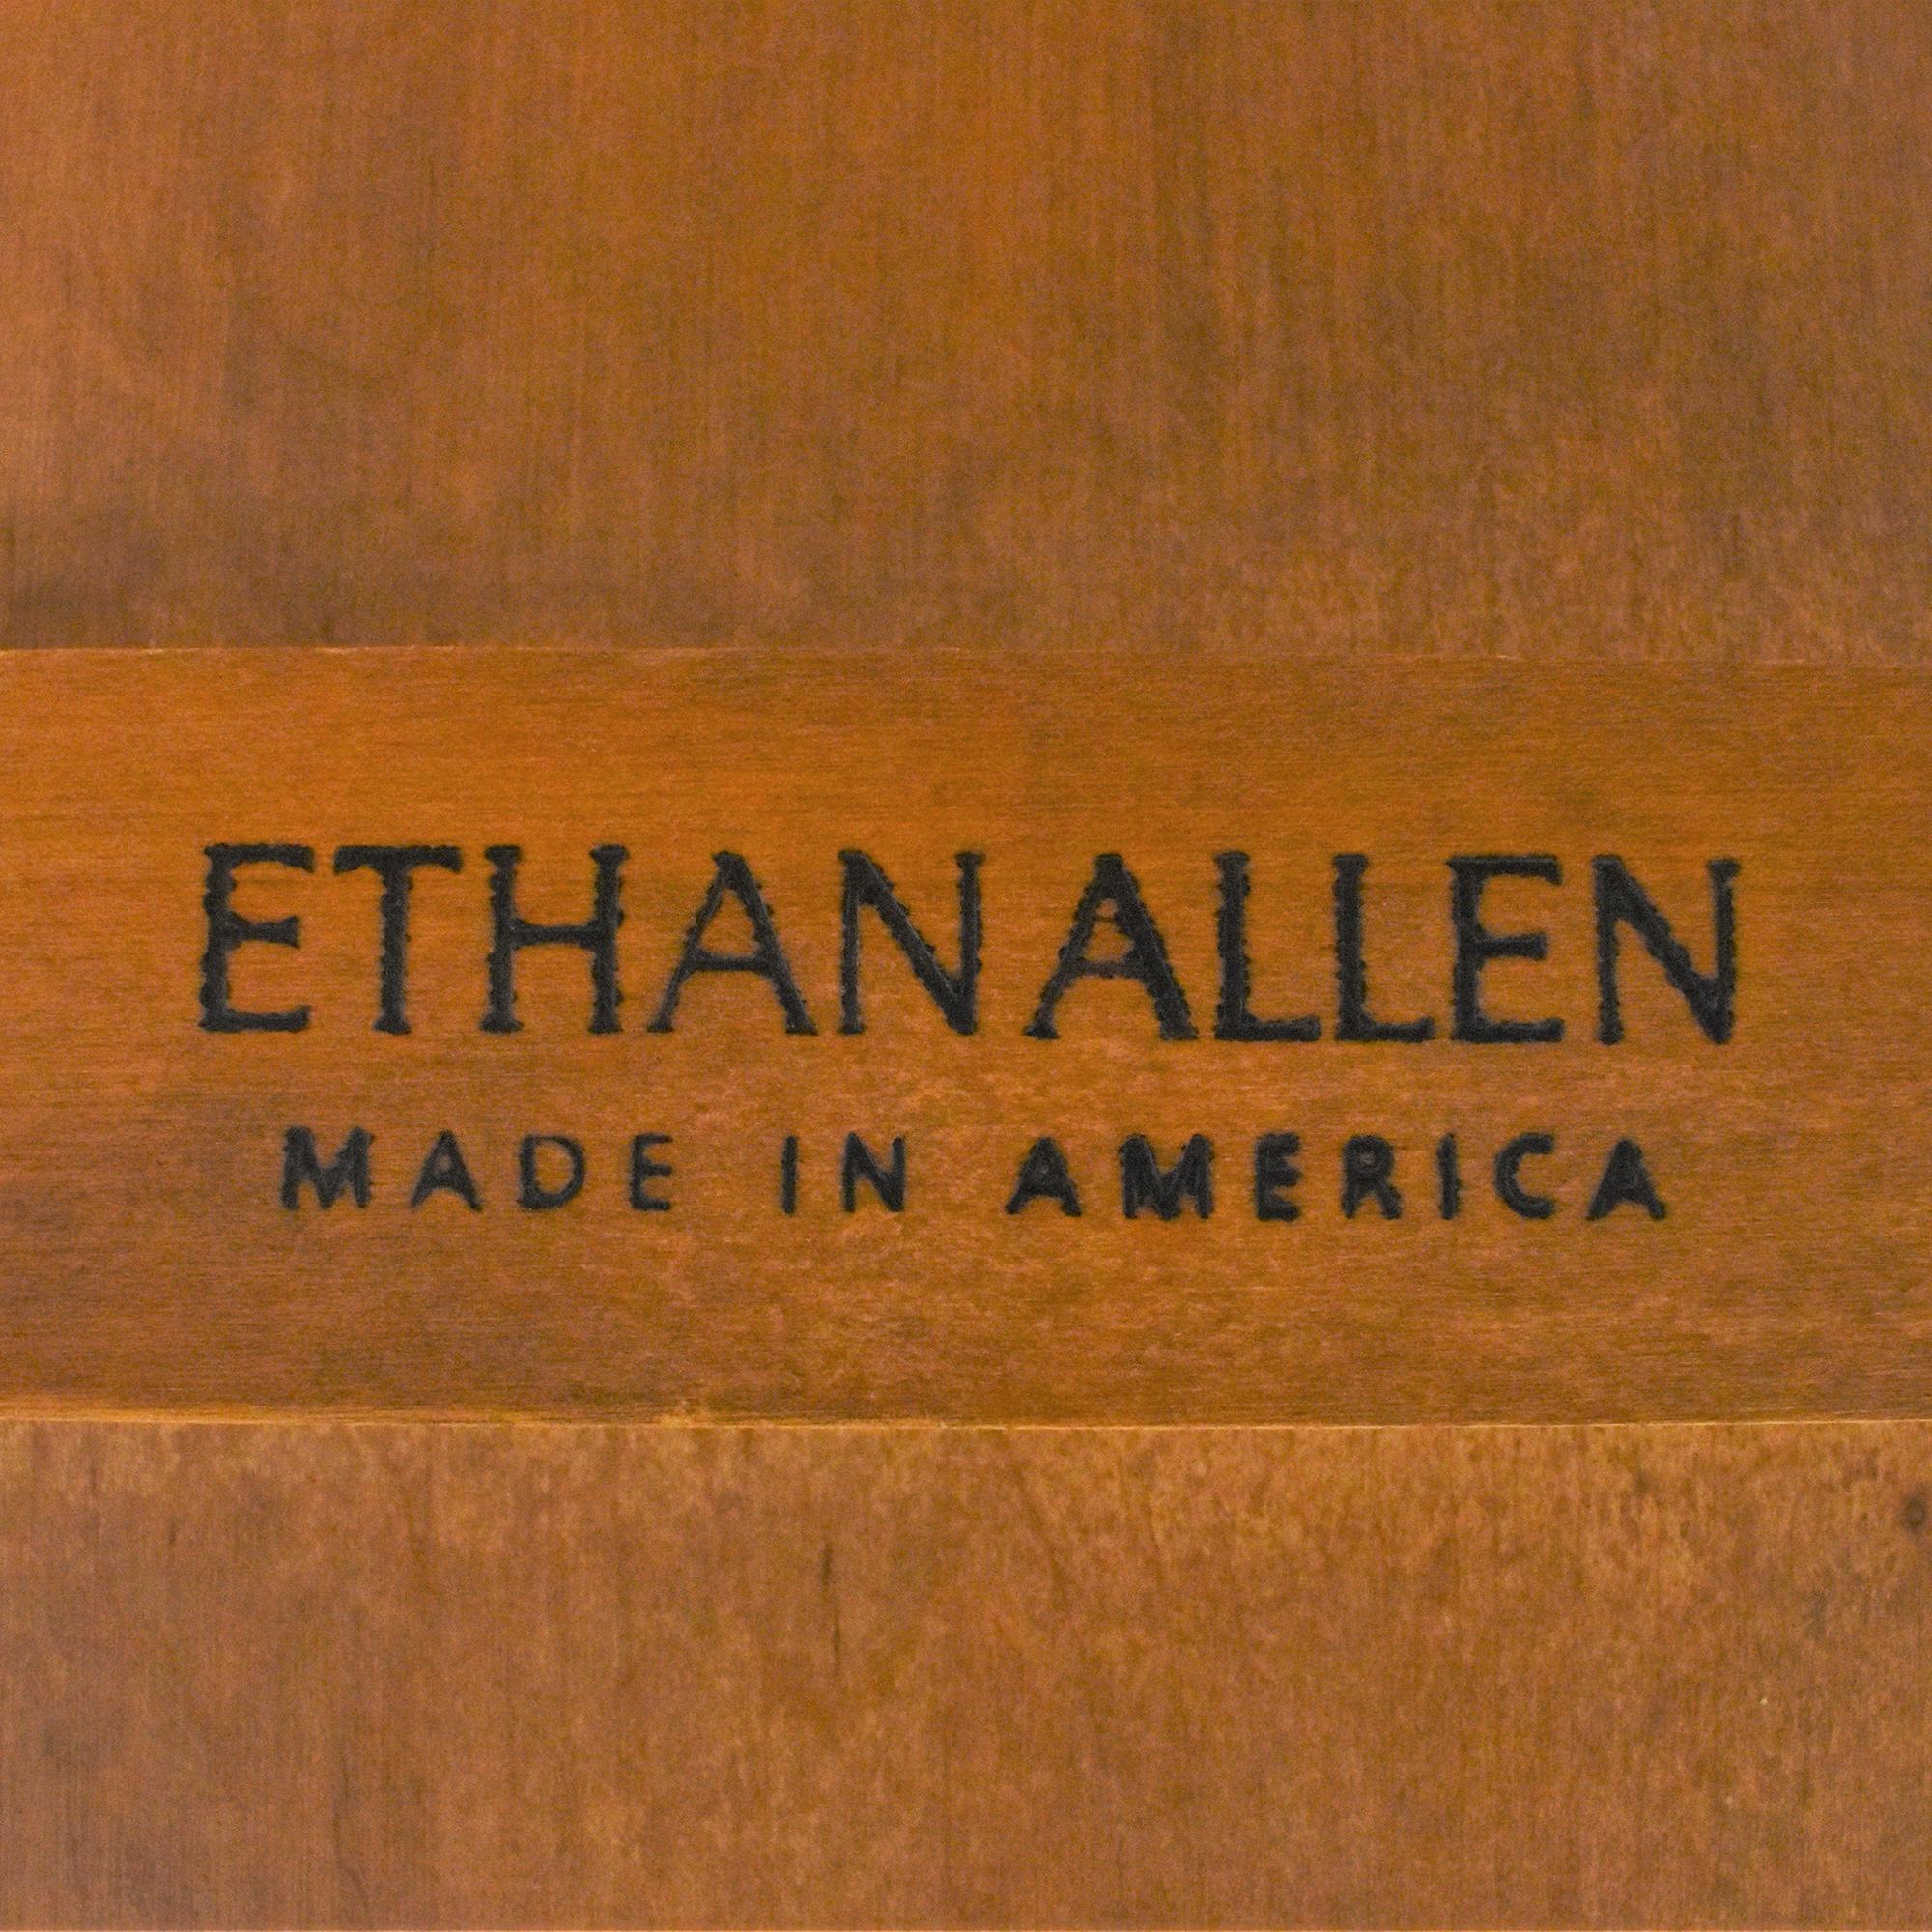 Ethan Allen Rectangular Coffee Table / Coffee Tables